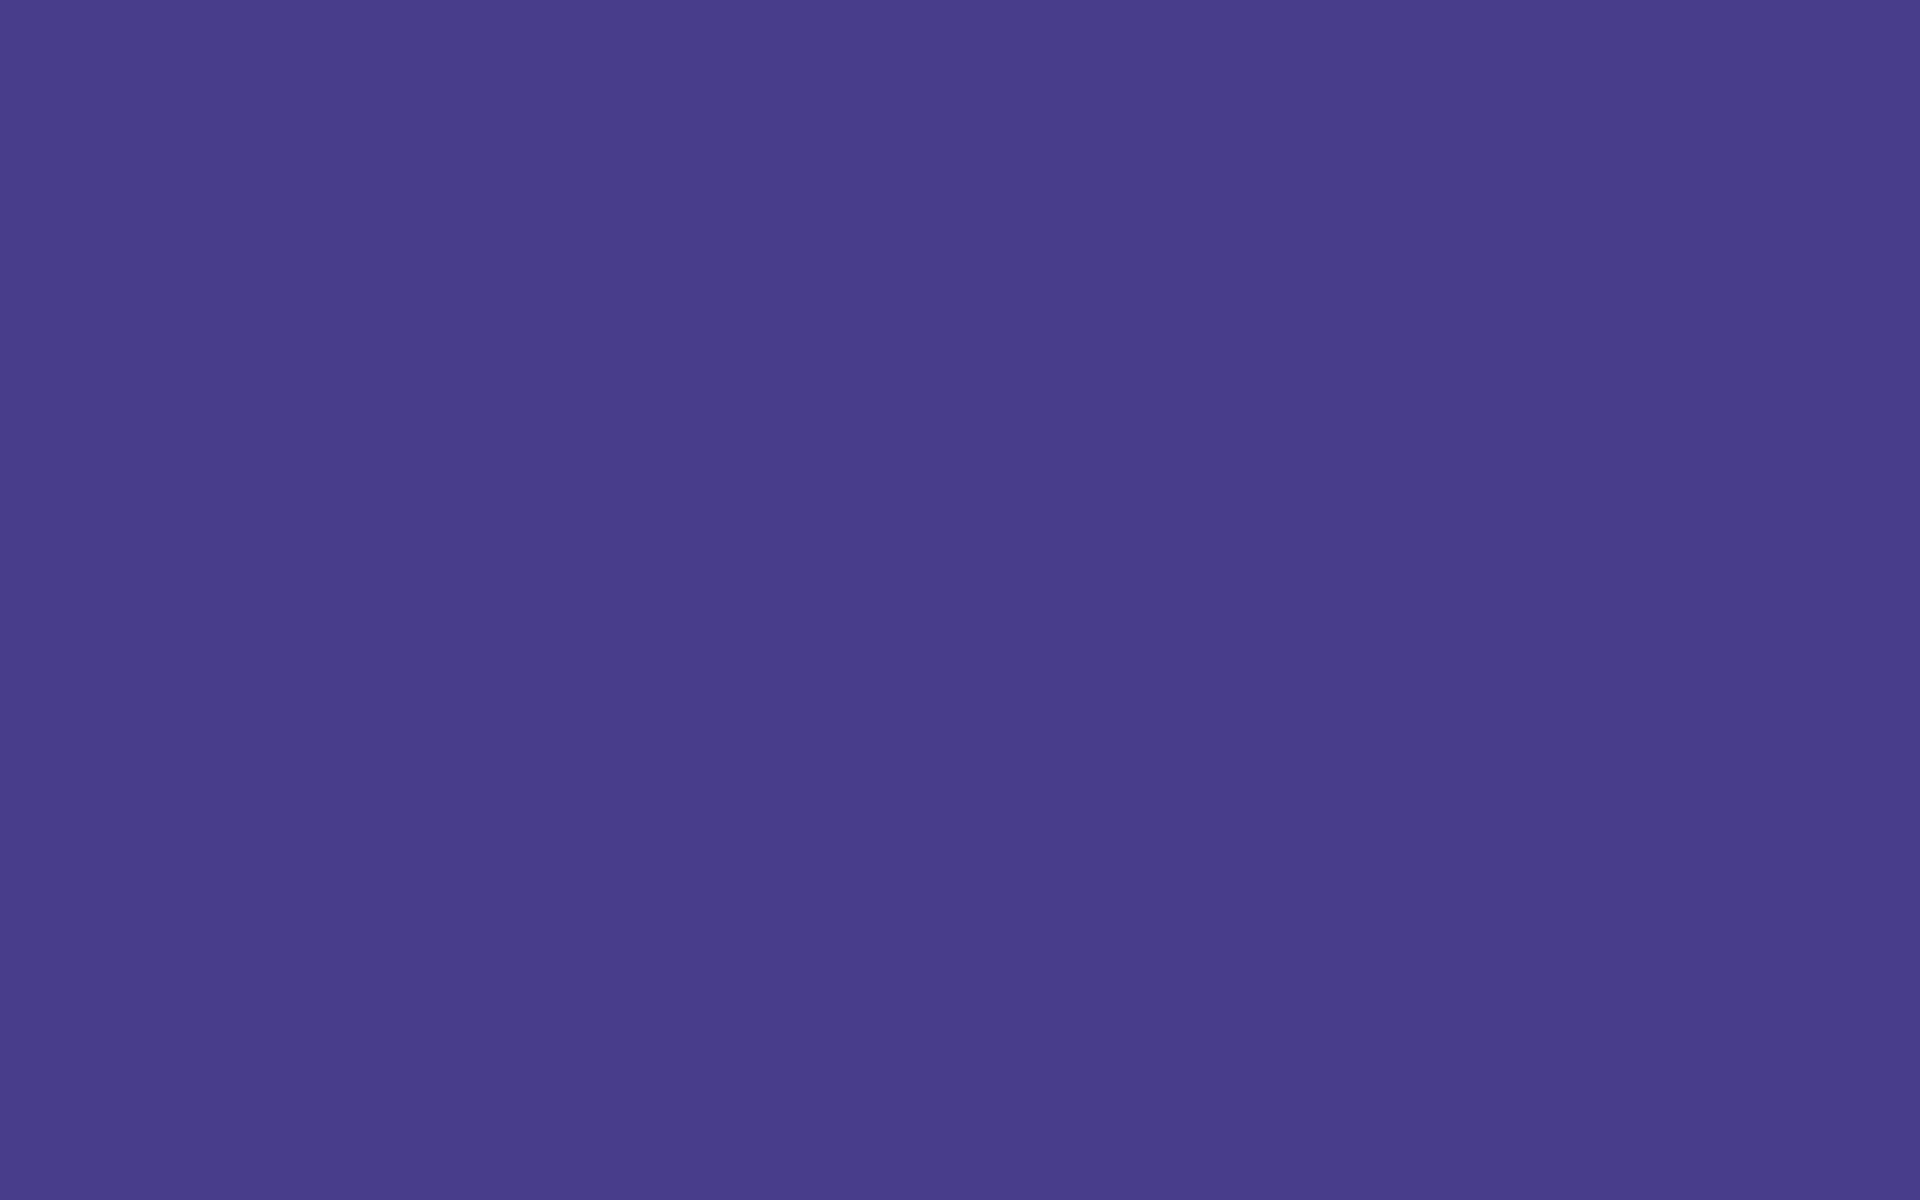 1920x1200 Dark Slate Blue Solid Color Background